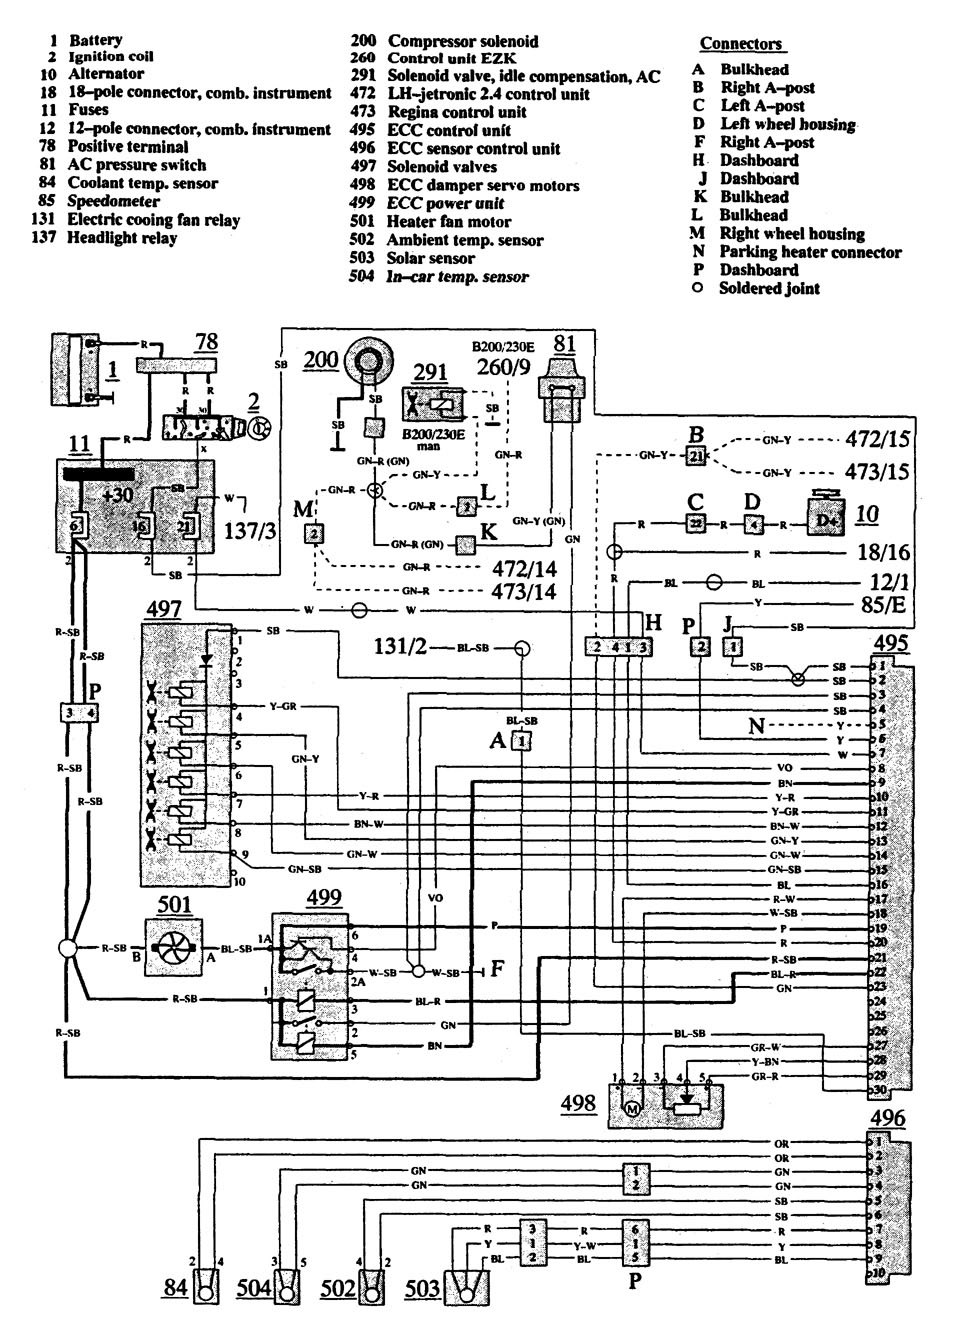 Enjoyable Volvo 740 Wiring Diagram Starter Basic Electronics Wiring Diagram Wiring Cloud Icalpermsplehendilmohammedshrineorg